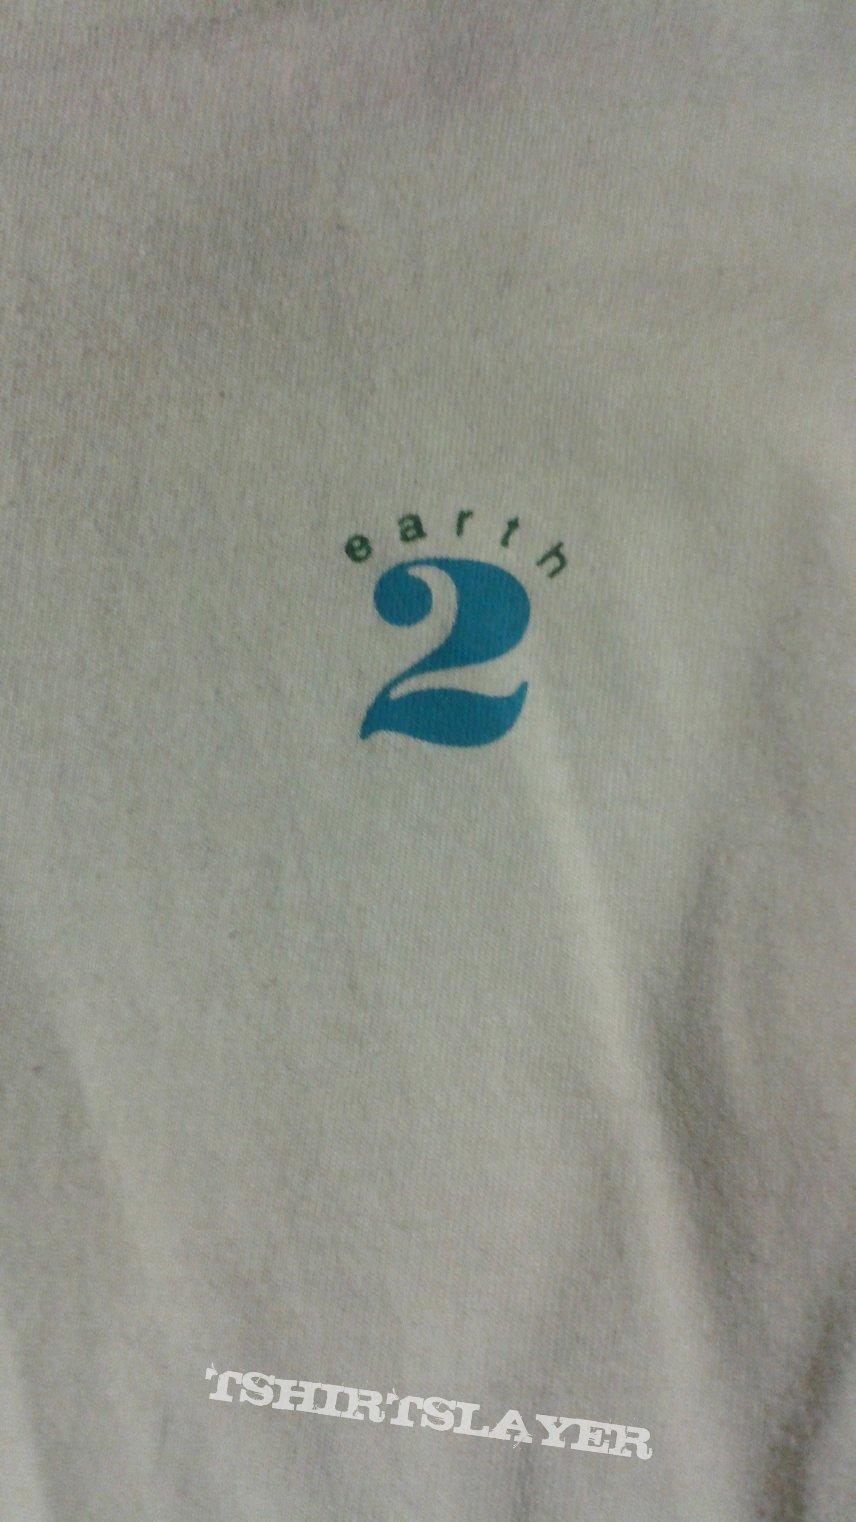 Earth 2 Double Uoglobe Brand long sleeve t-shirt.